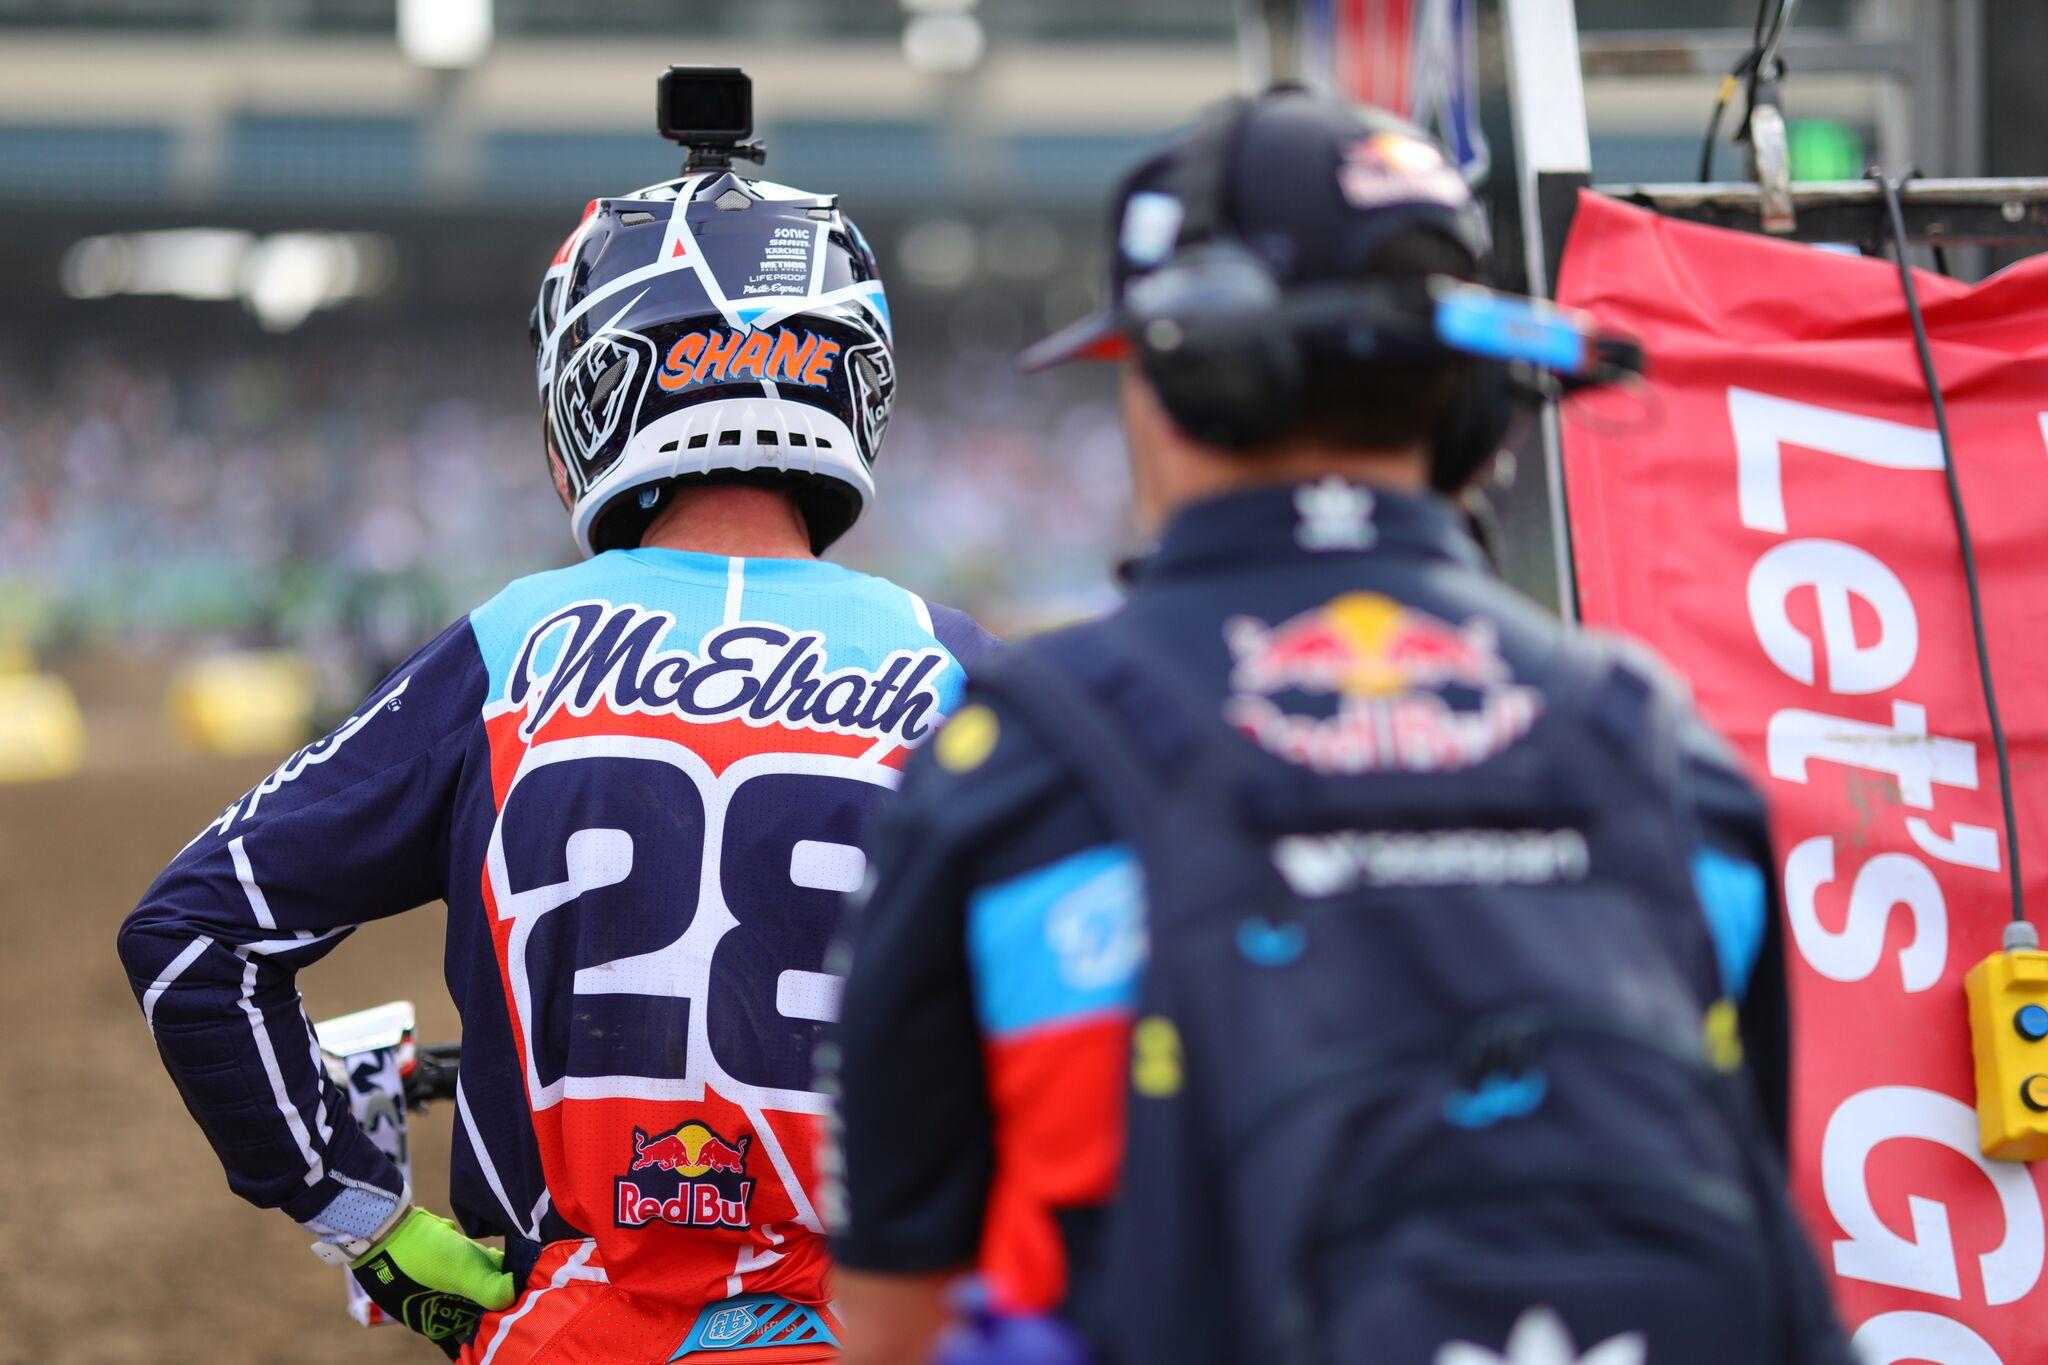 Shane McElrath KTM